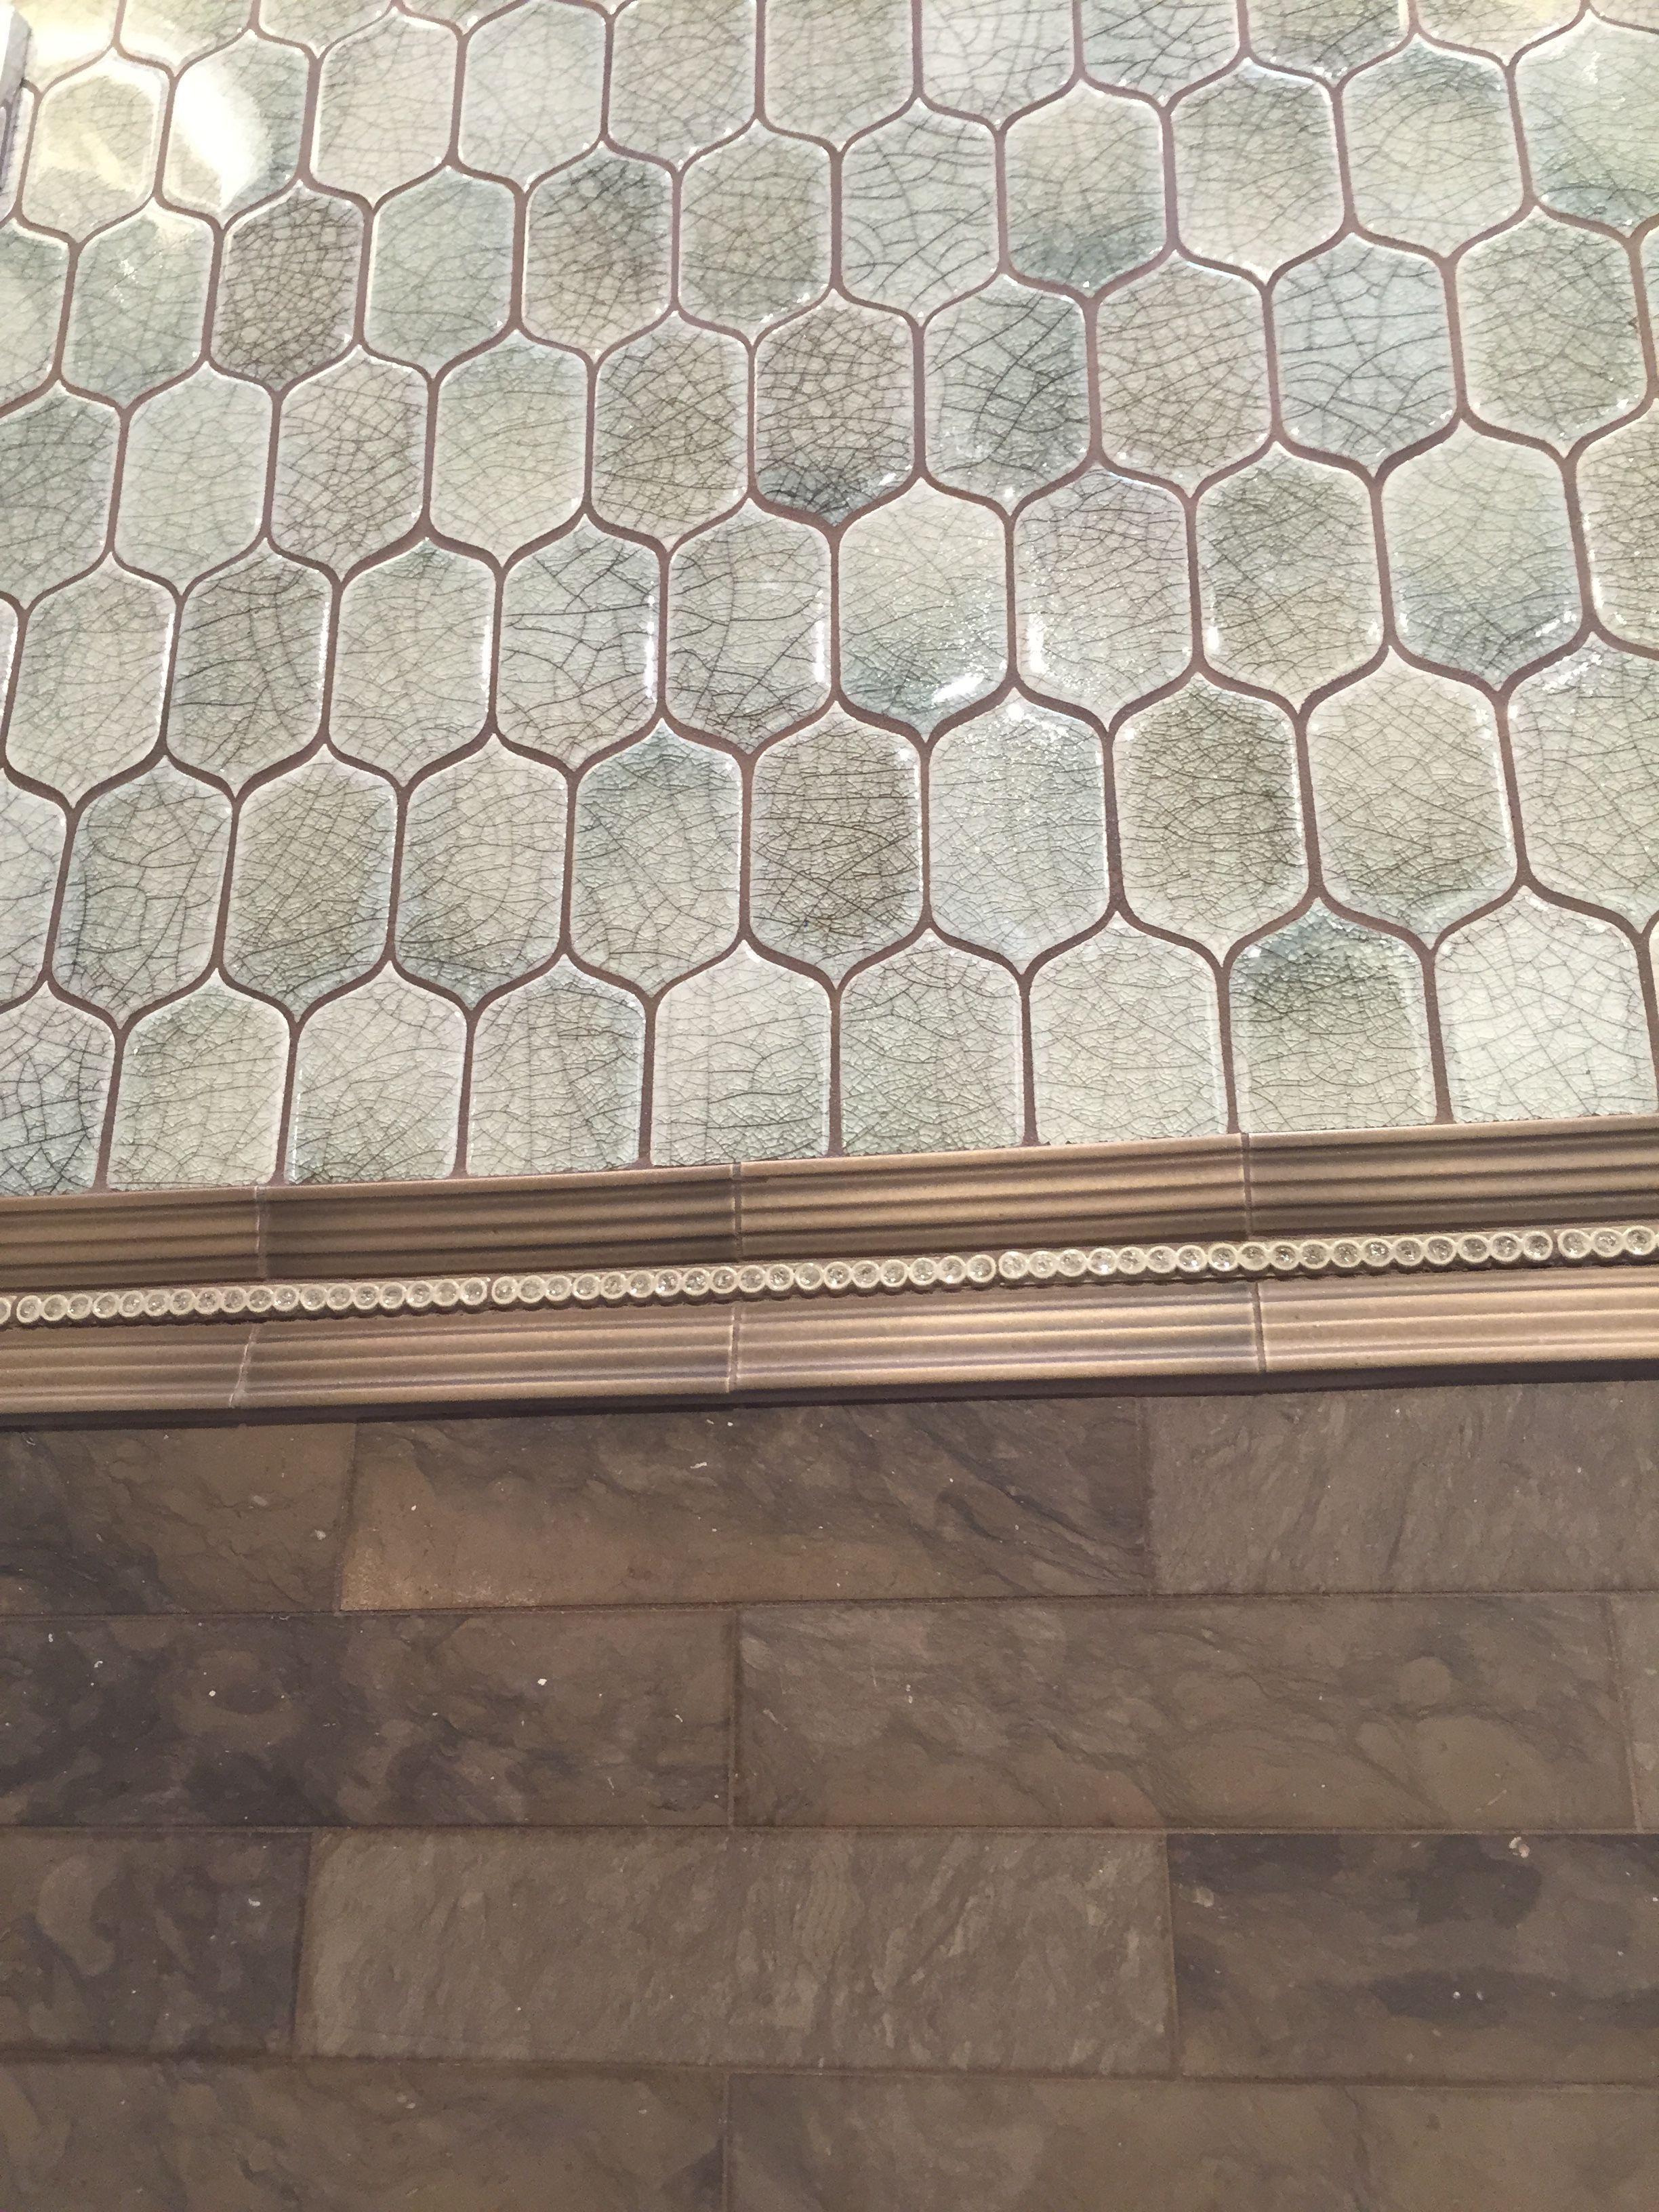 28 the creative unusual tile ideas